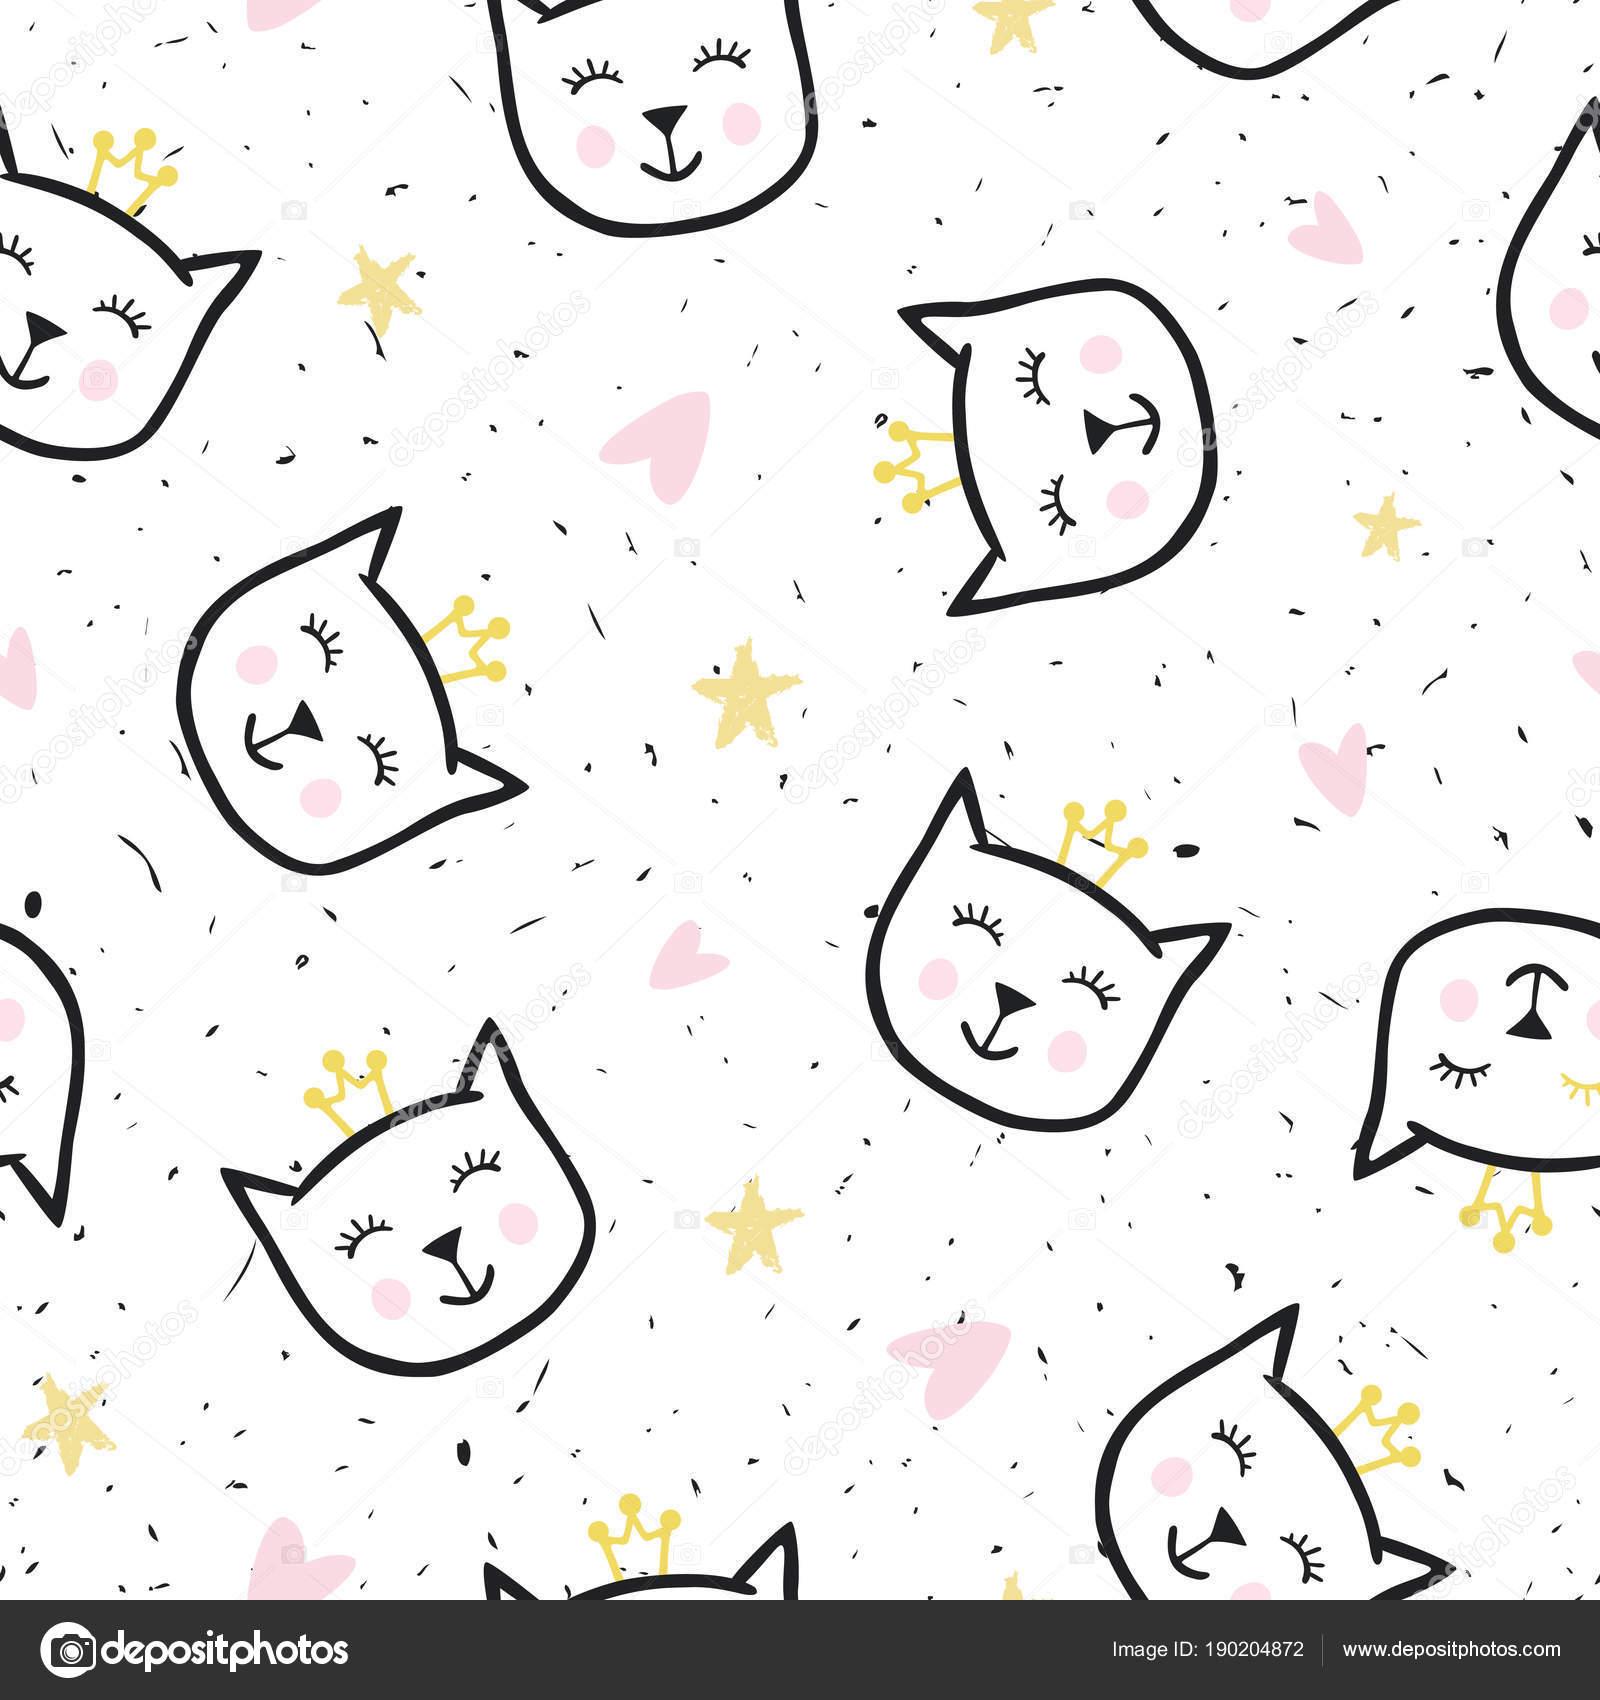 Papel Deco Para Imprimir Bebe Textura Transparente Con Gatos